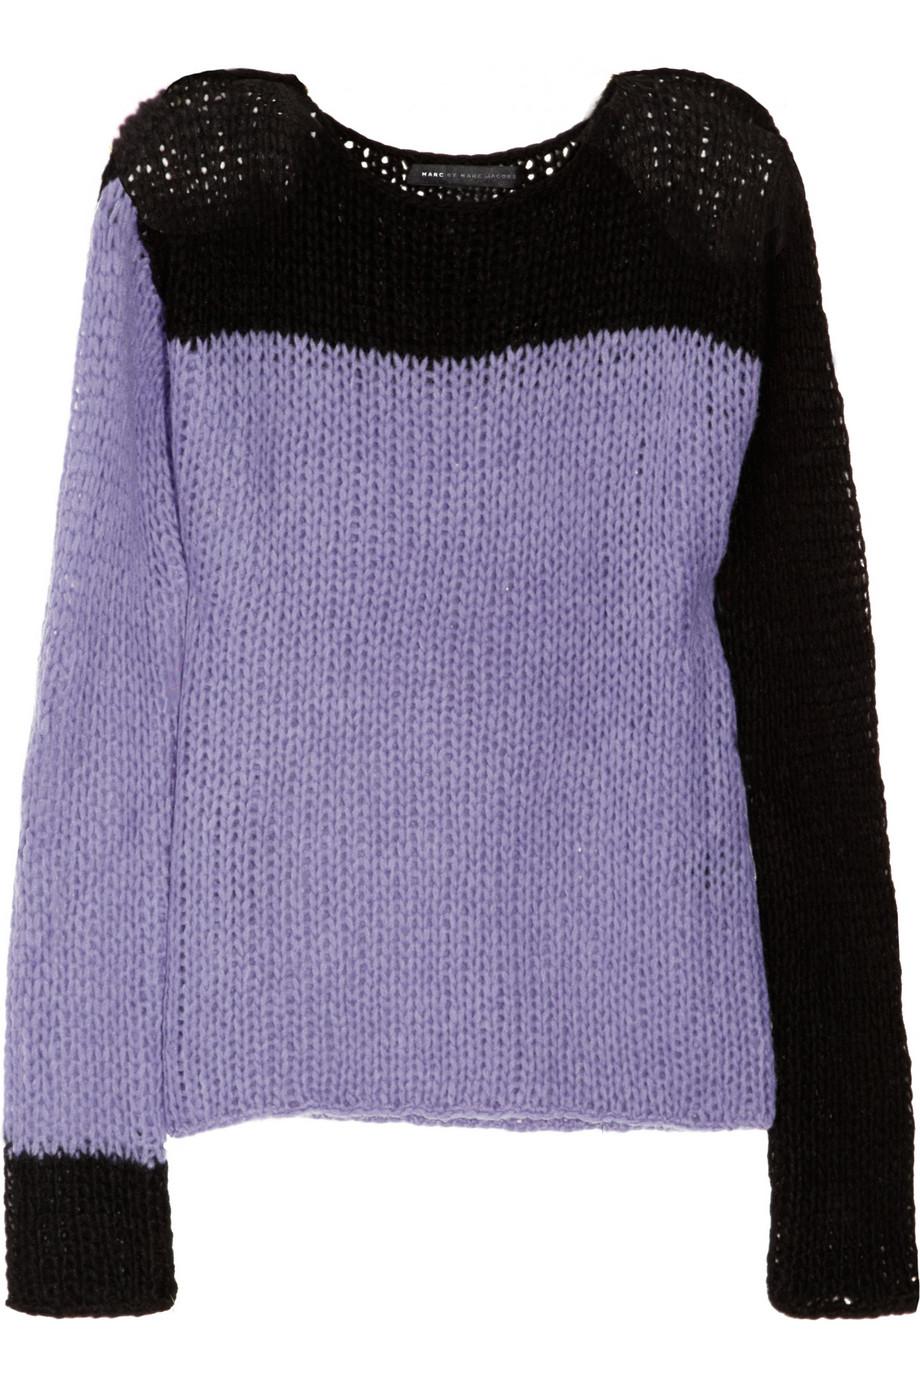 marc by marc jacobs bee openknit woolblend sweater in purple lyst. Black Bedroom Furniture Sets. Home Design Ideas